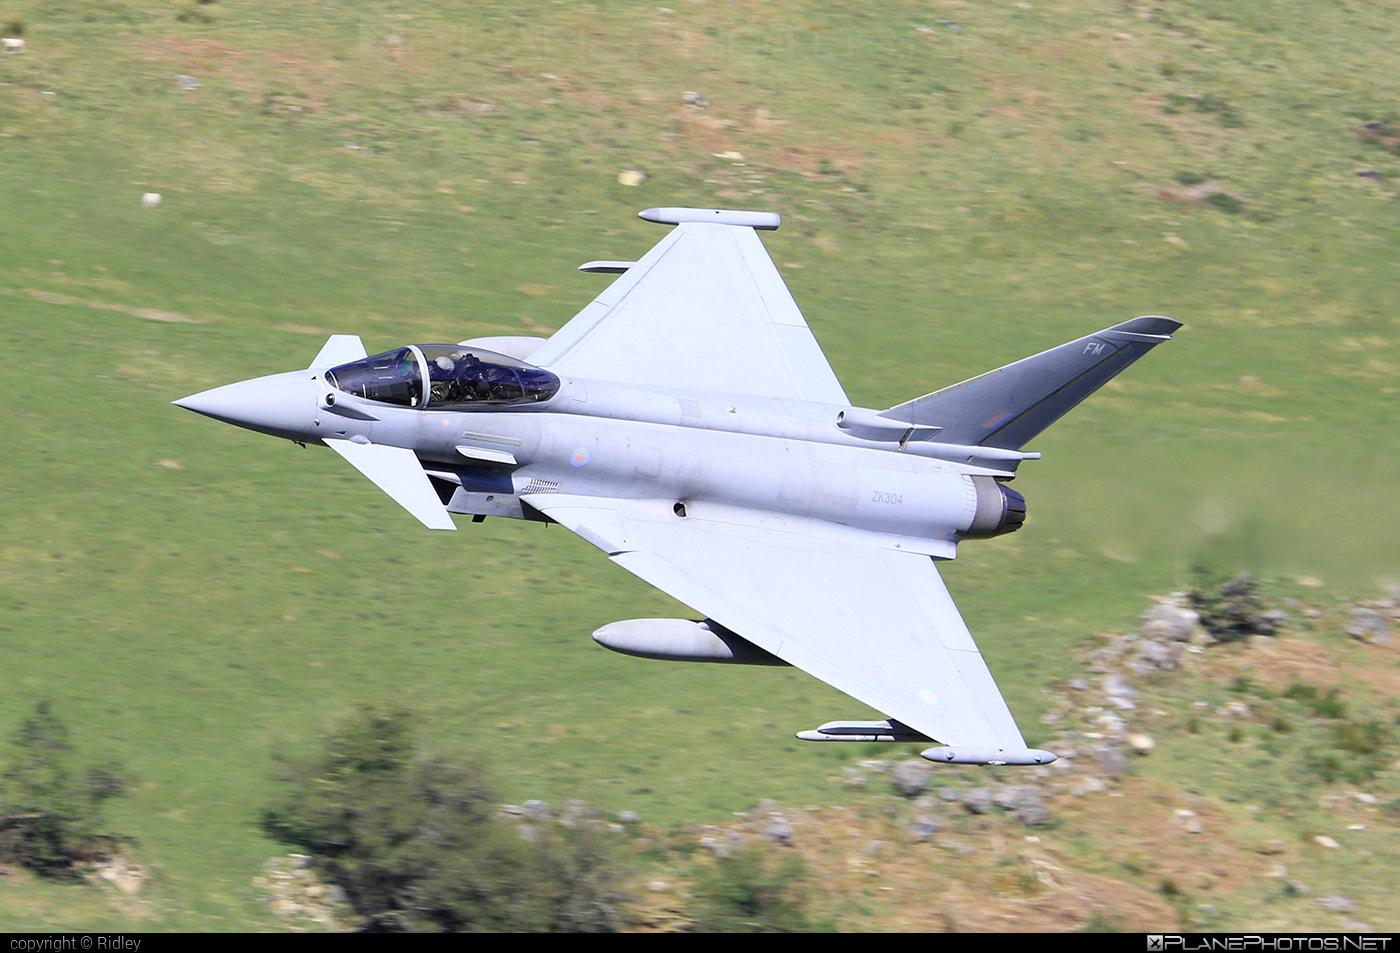 Eurofighter Typhoon FGR.4 - ZK304 operated by Royal Air Force (RAF) #eurofighter #machloop #raf #royalairforce #typhoon